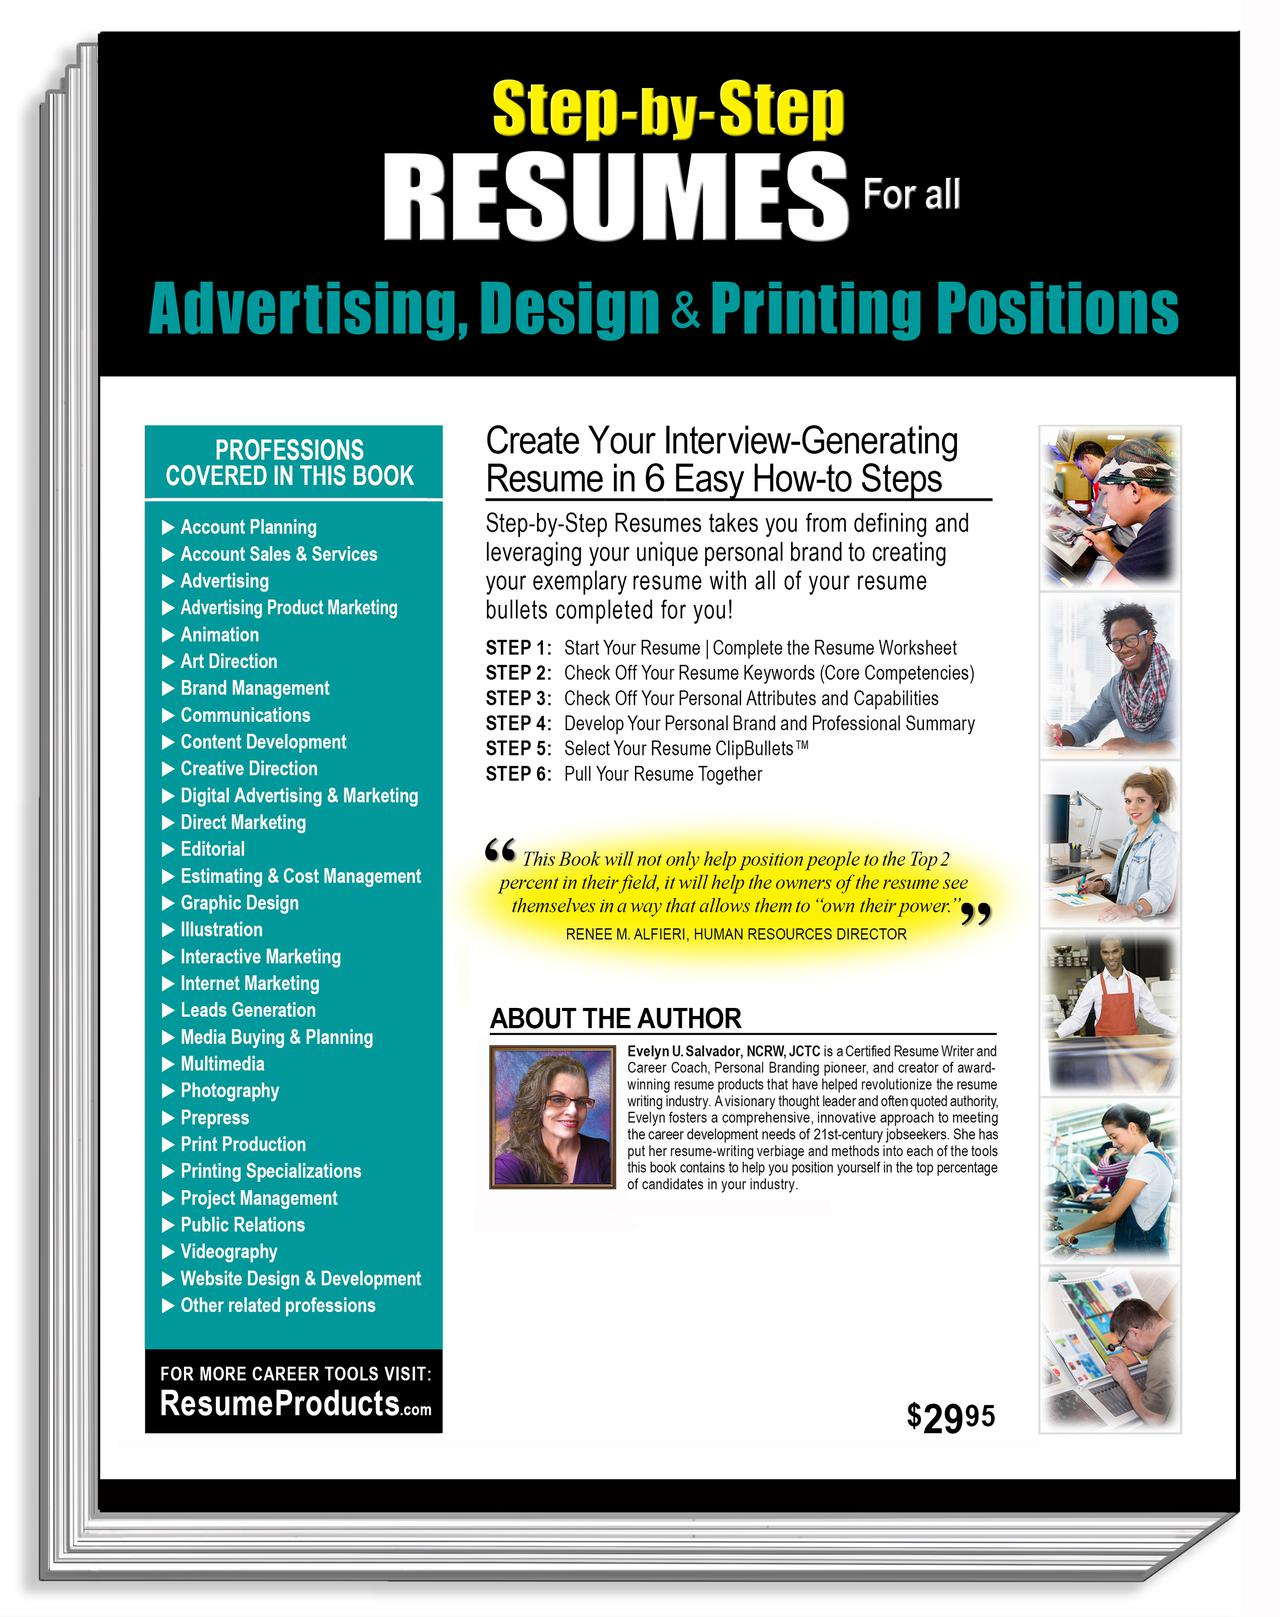 advertising, design & printing bc.jpg